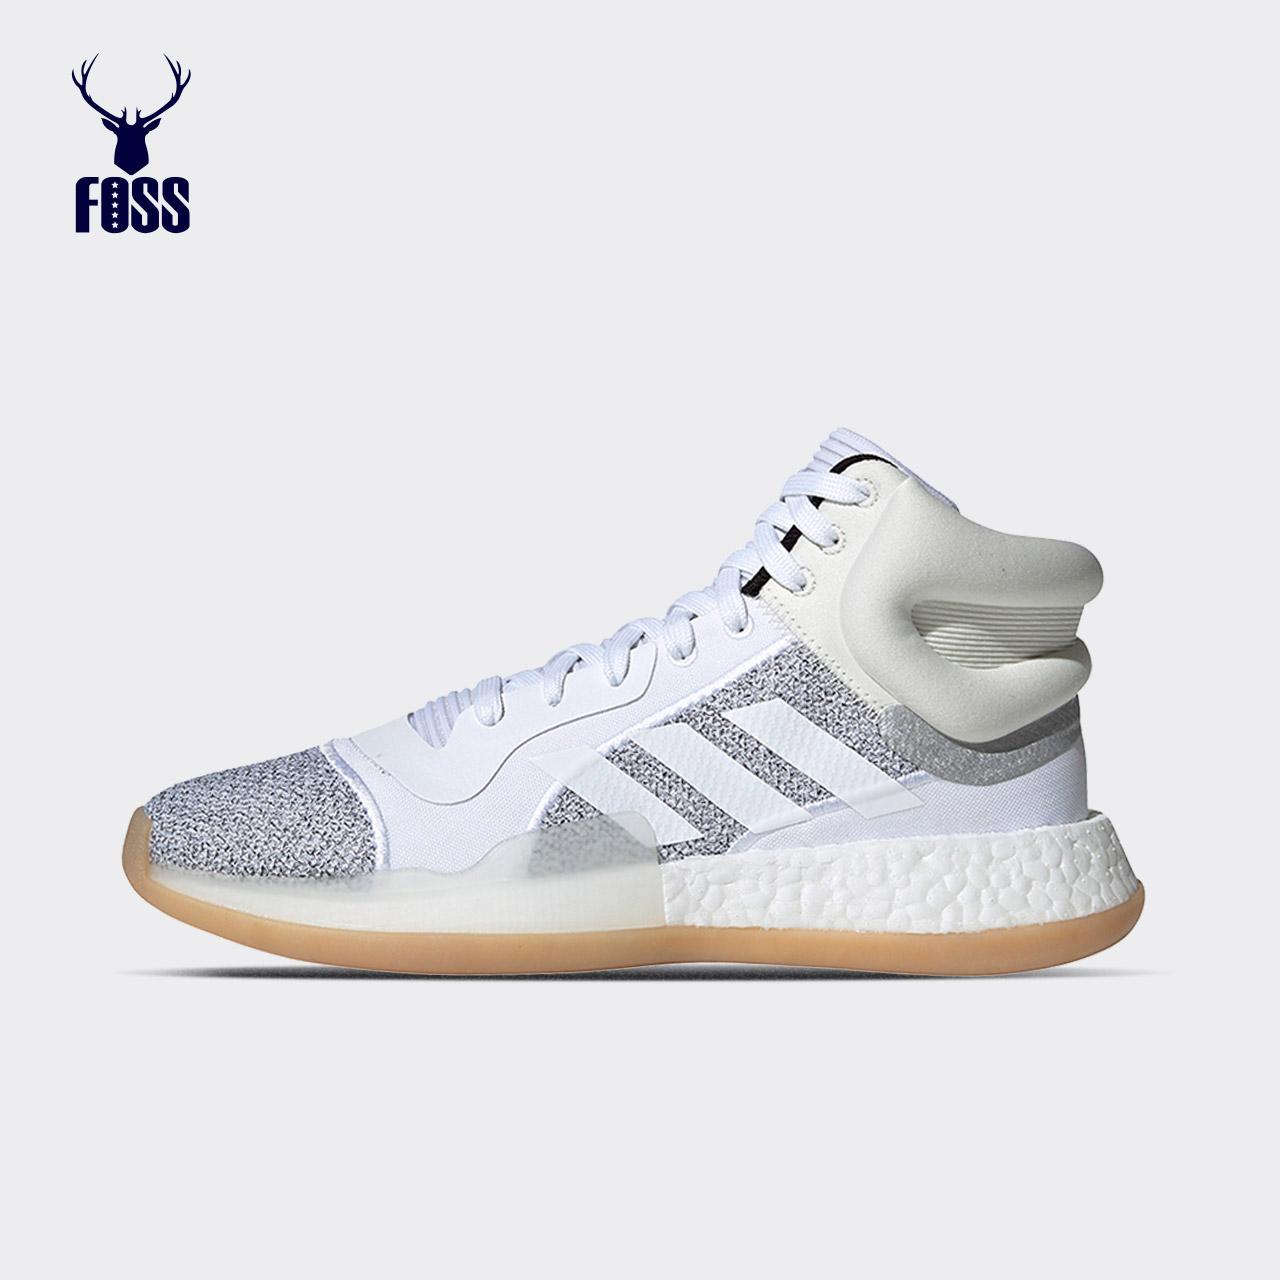 【FOSS】阿迪达斯2019男子Marquee Boost篮球BOOST篮球鞋BB9299